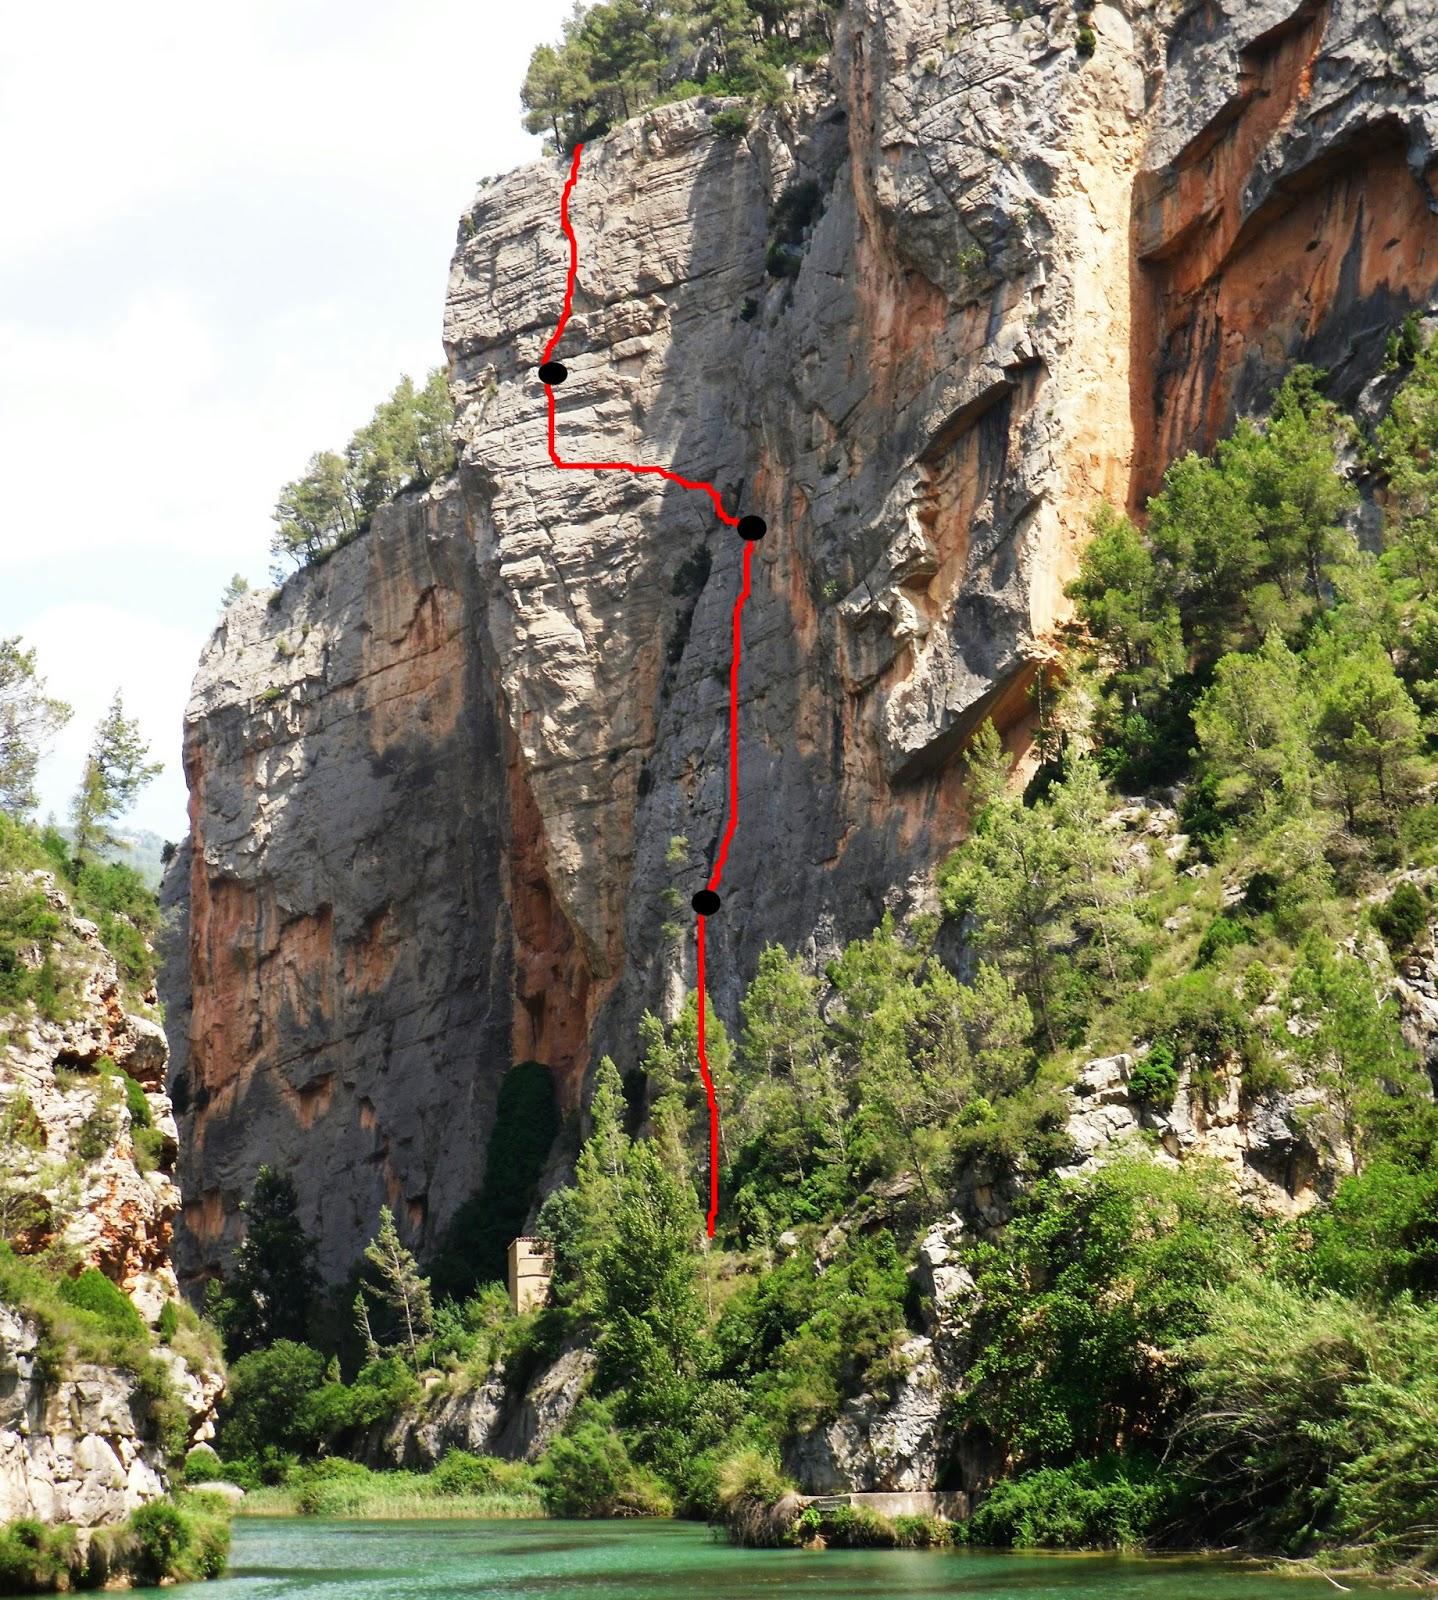 ESCALADA-LEVANTE-THECLIMB-croquis-pericondrio montanejos